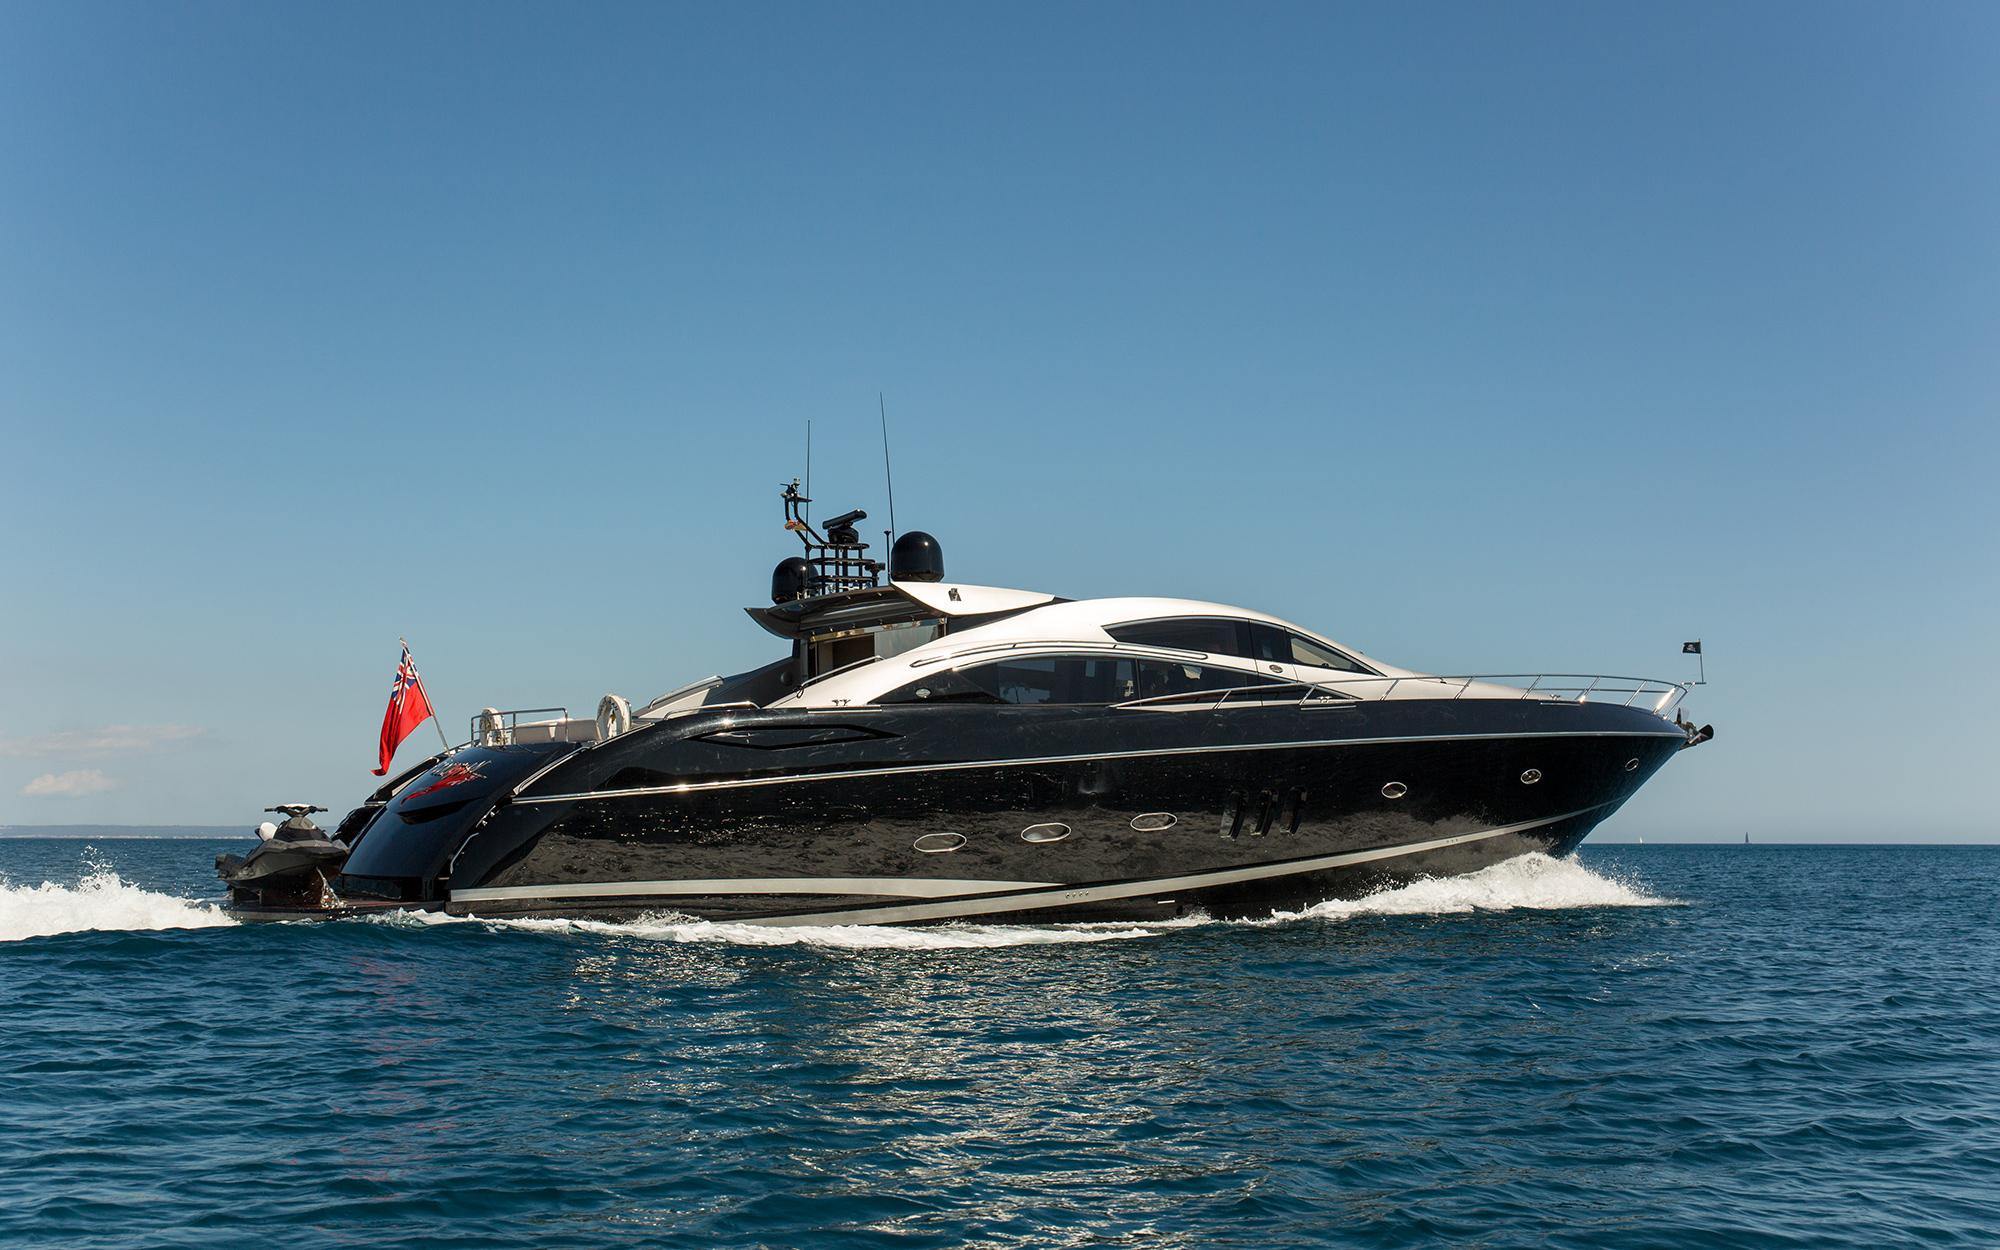 HOOLIGAN-yacht-For-sale-charter-01.jpg